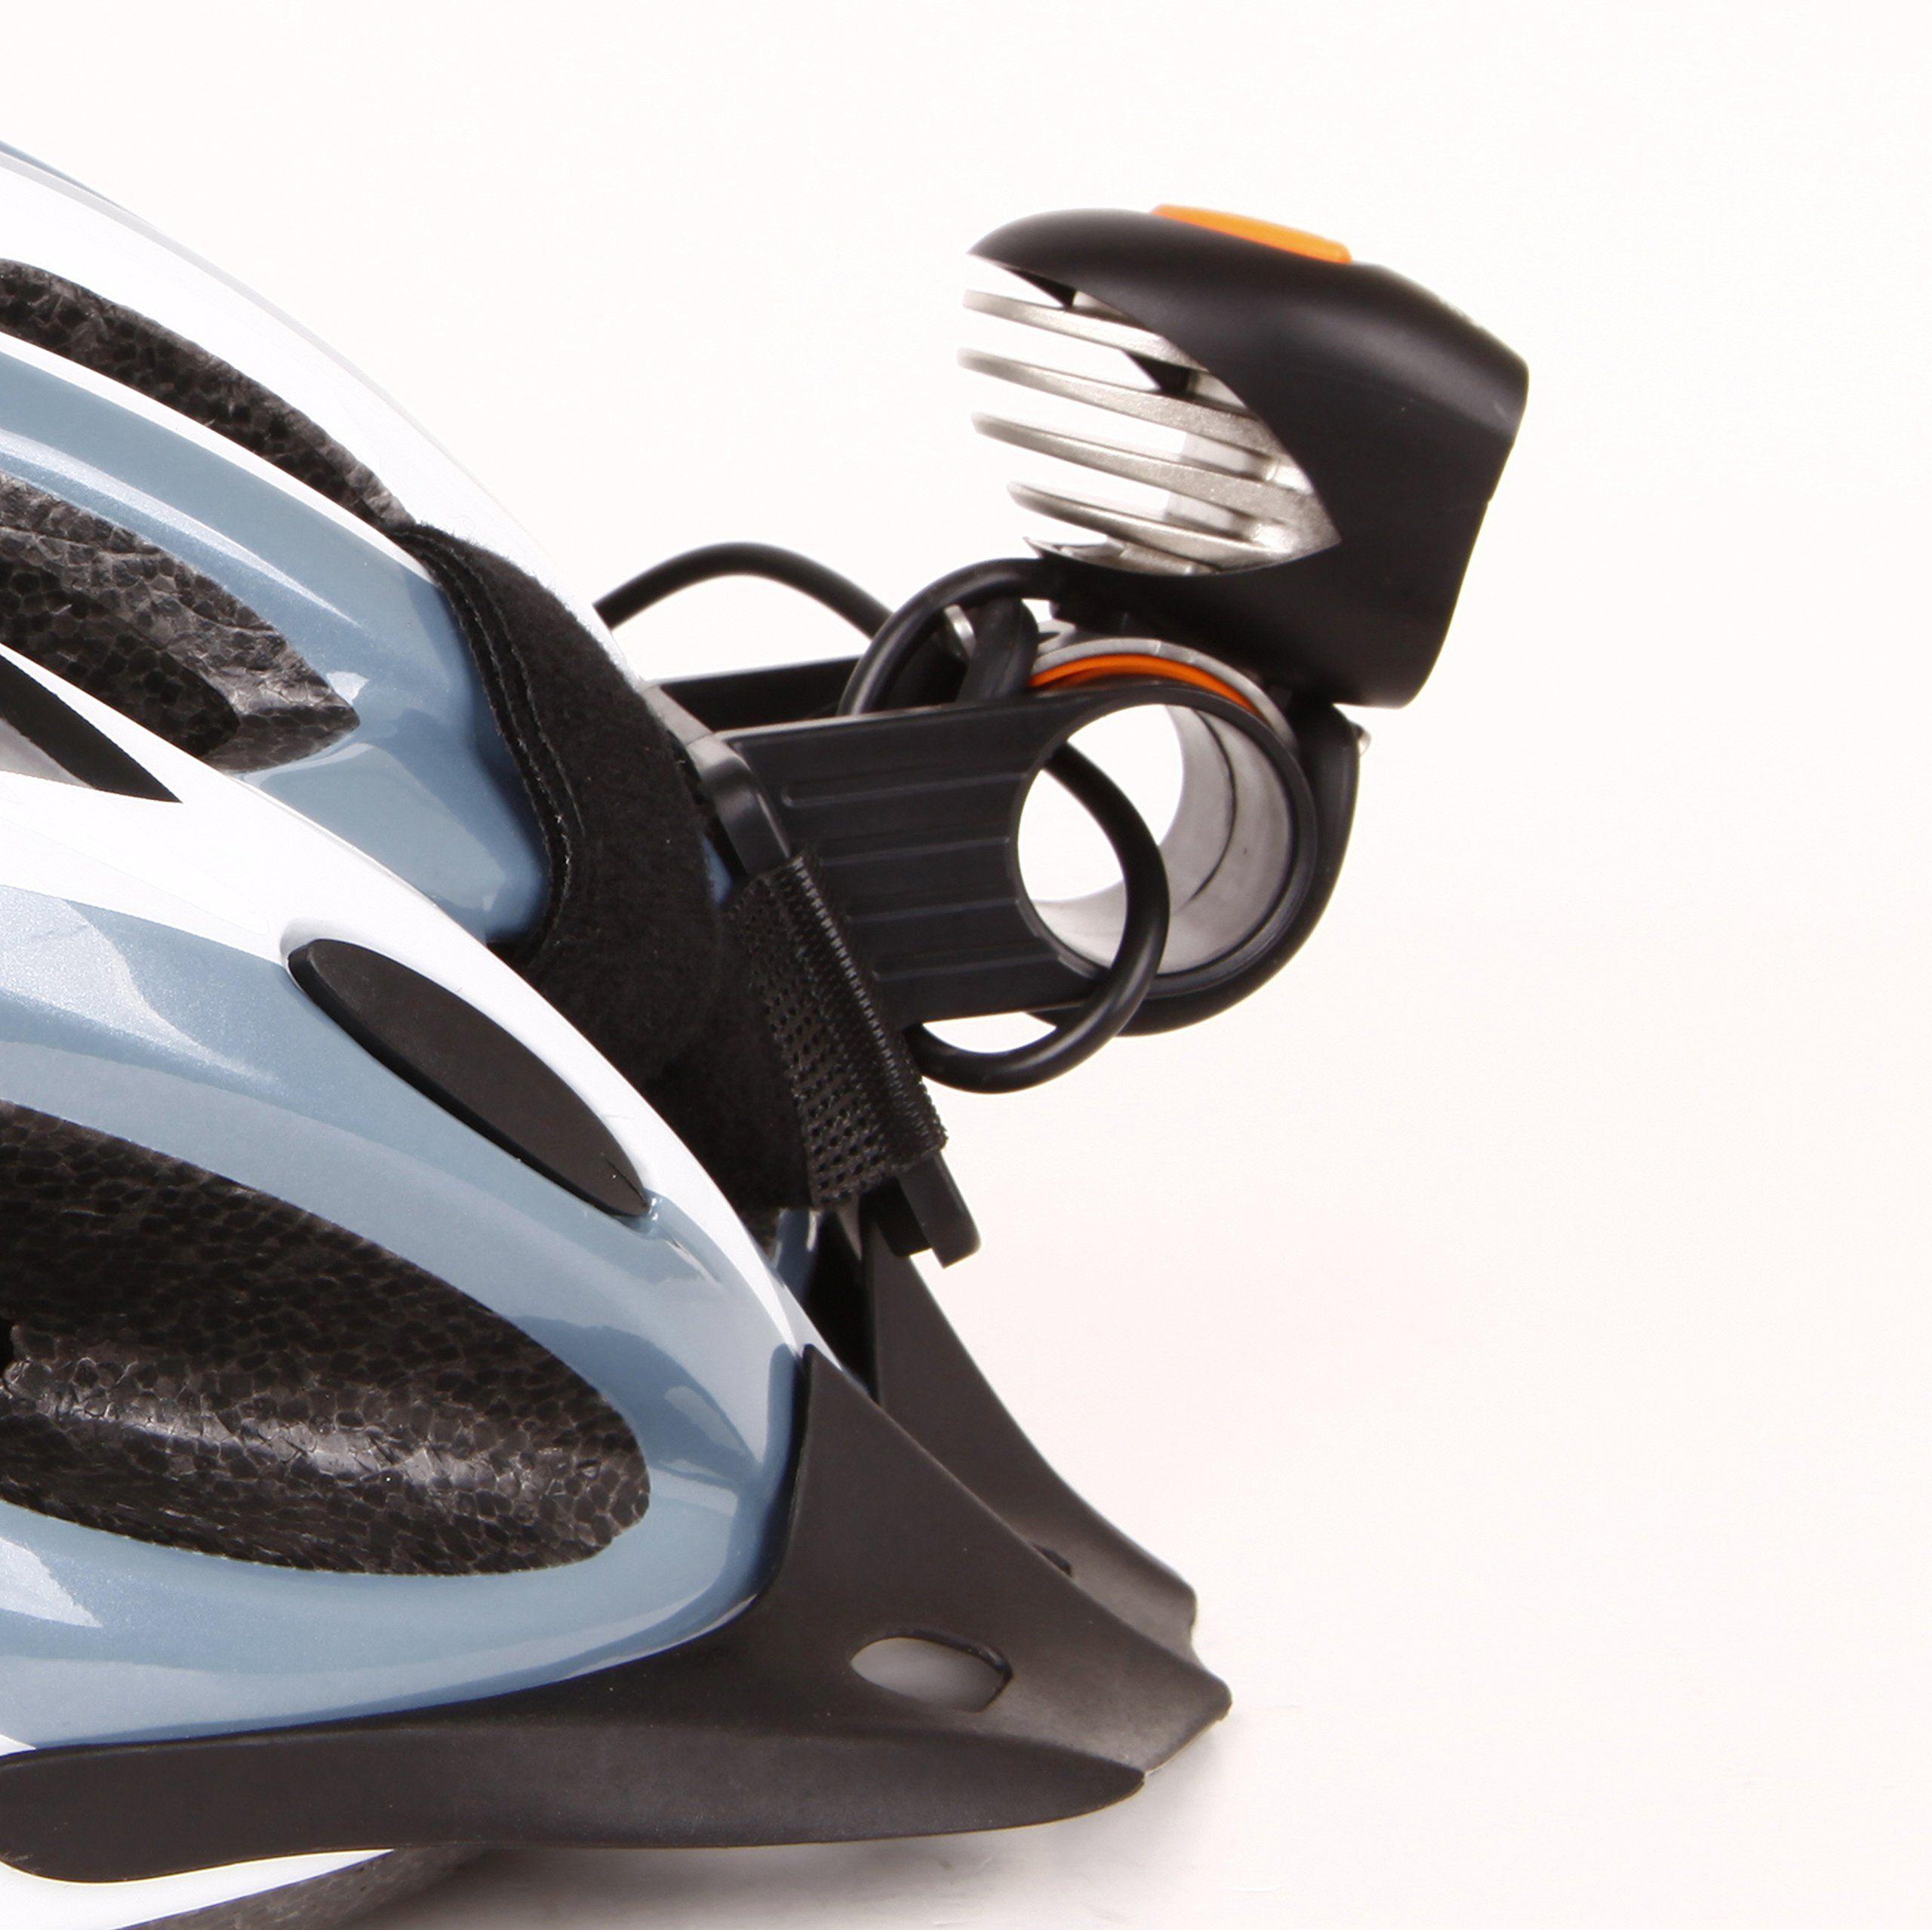 Magicshine Mj 900 1200 Lumens Front Bike Light Cree Led Waterproof Bike Light Perfect Led Bike Light For Mountain Biking R Helmet Light Bike Helmet Bike Lights